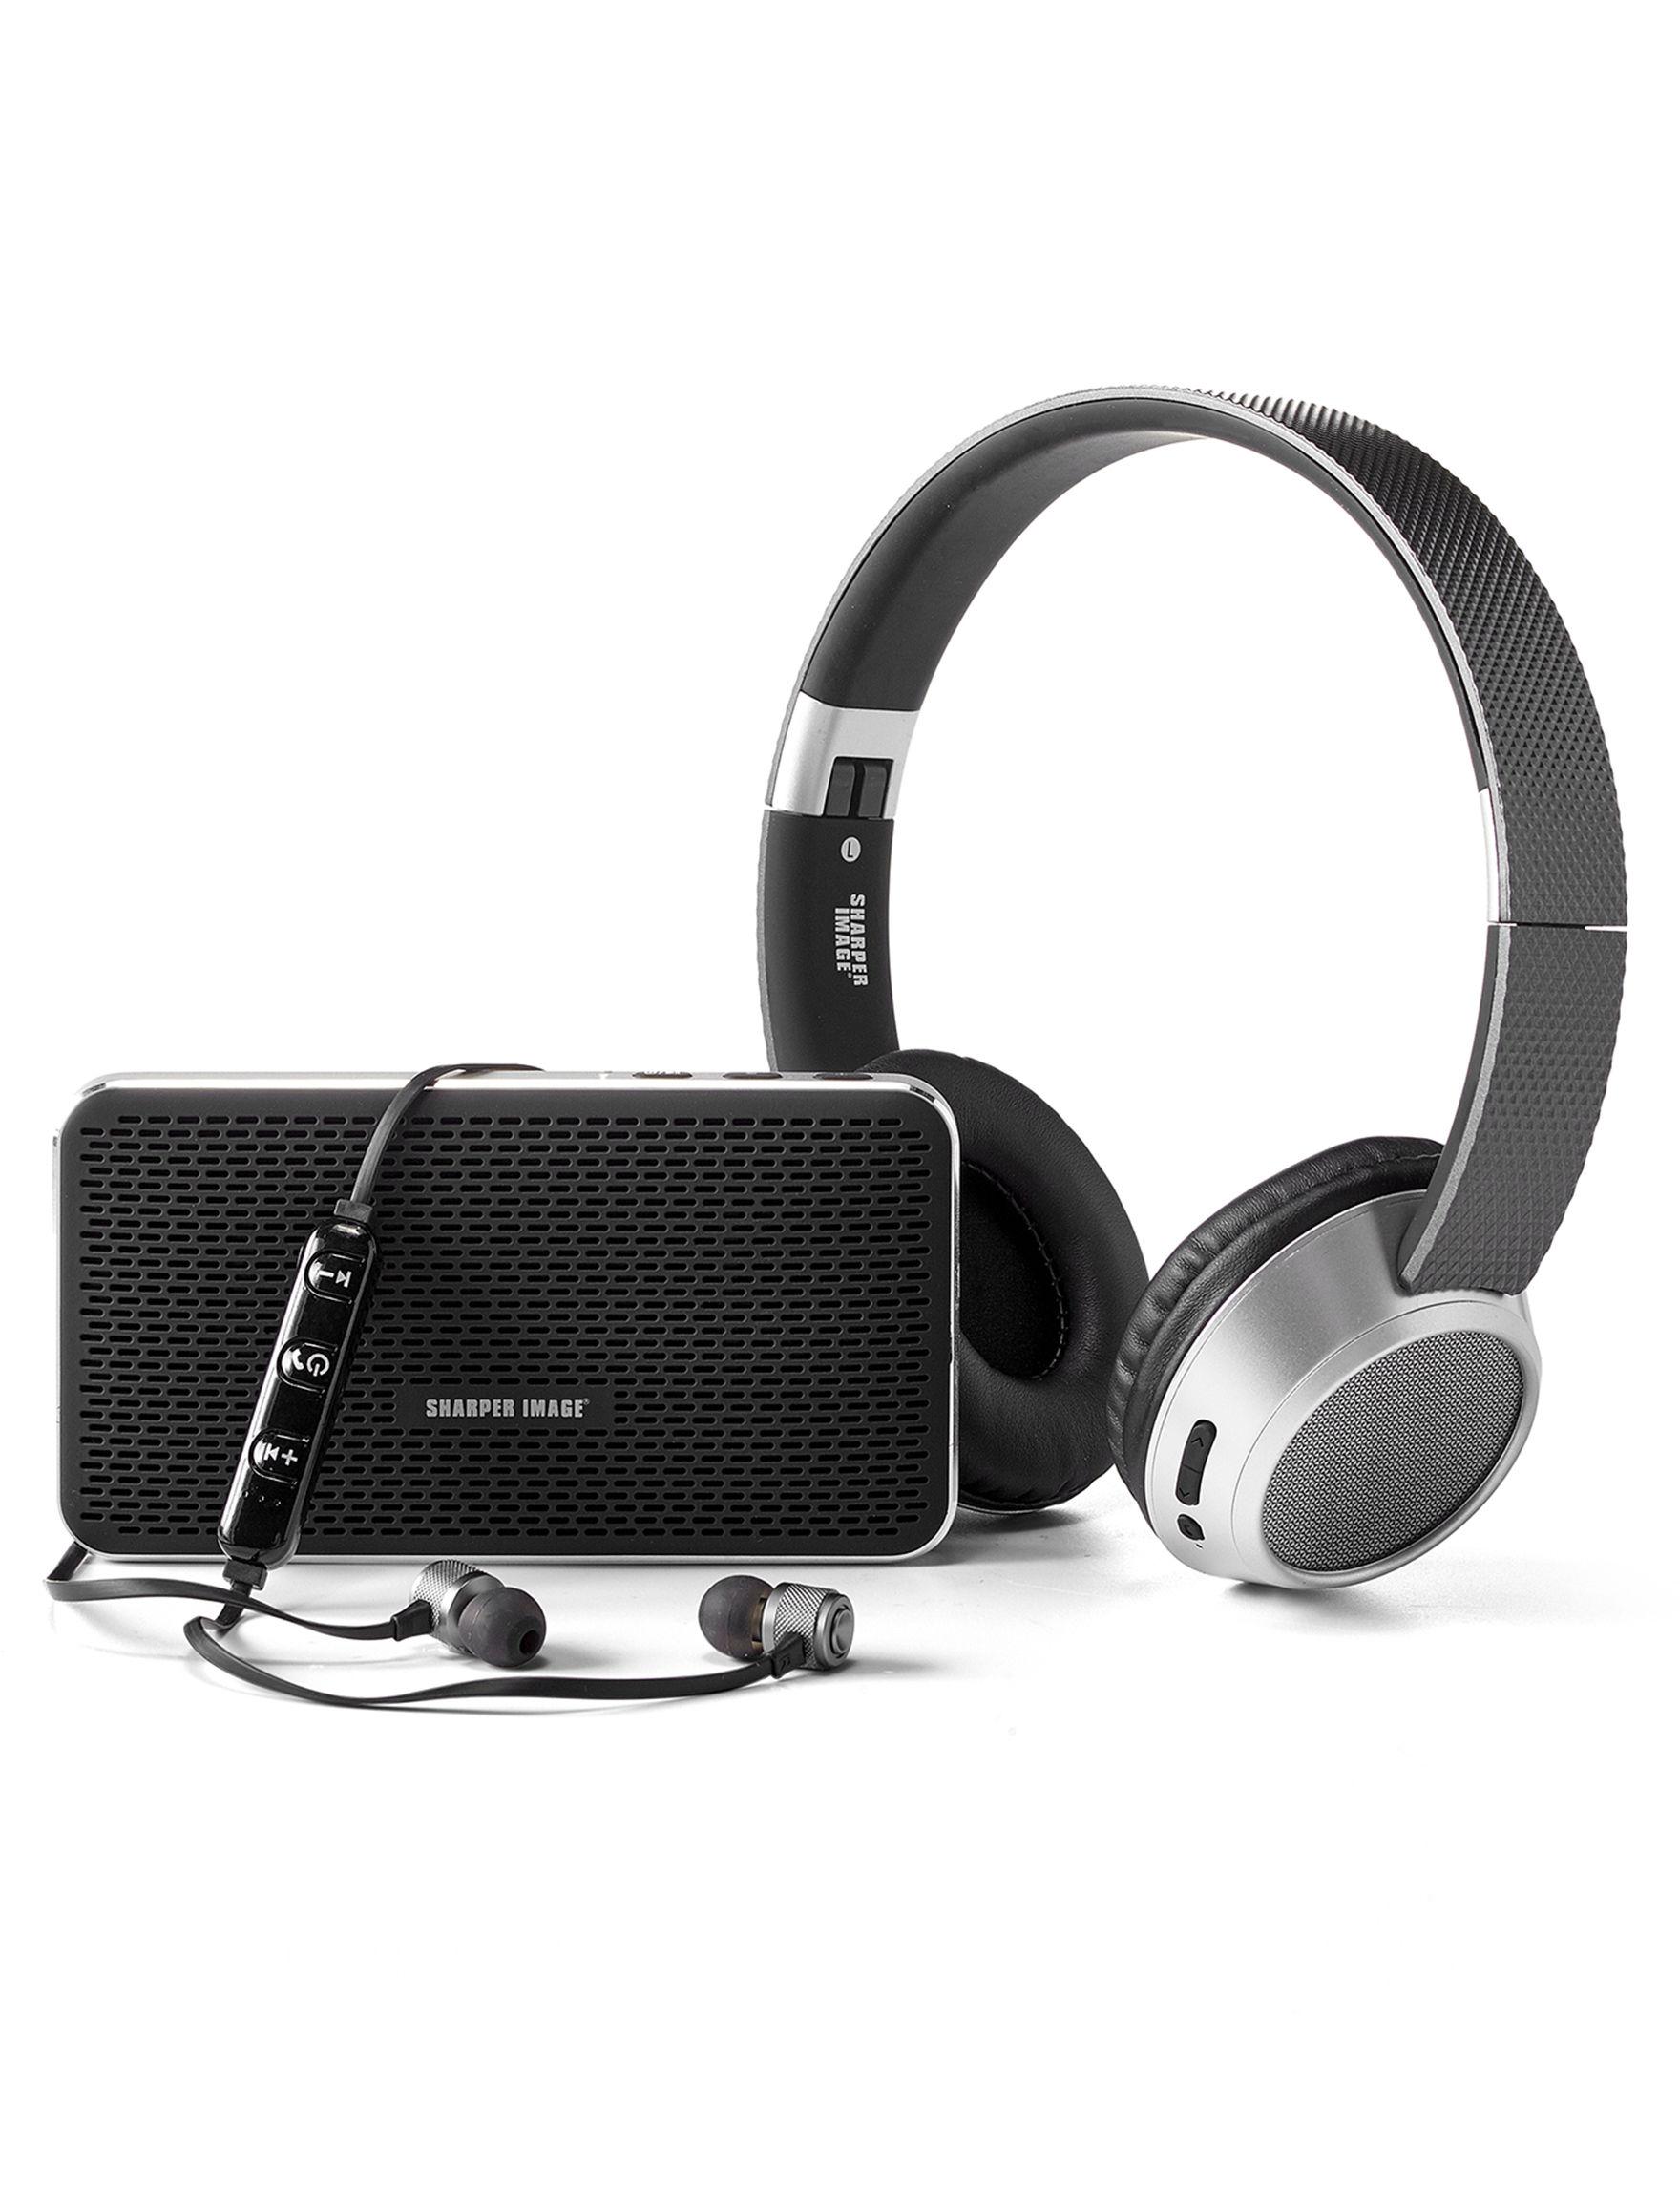 Sharper Image Black Headphones Speakers & Docks Home & Portable Audio Tech Accessories